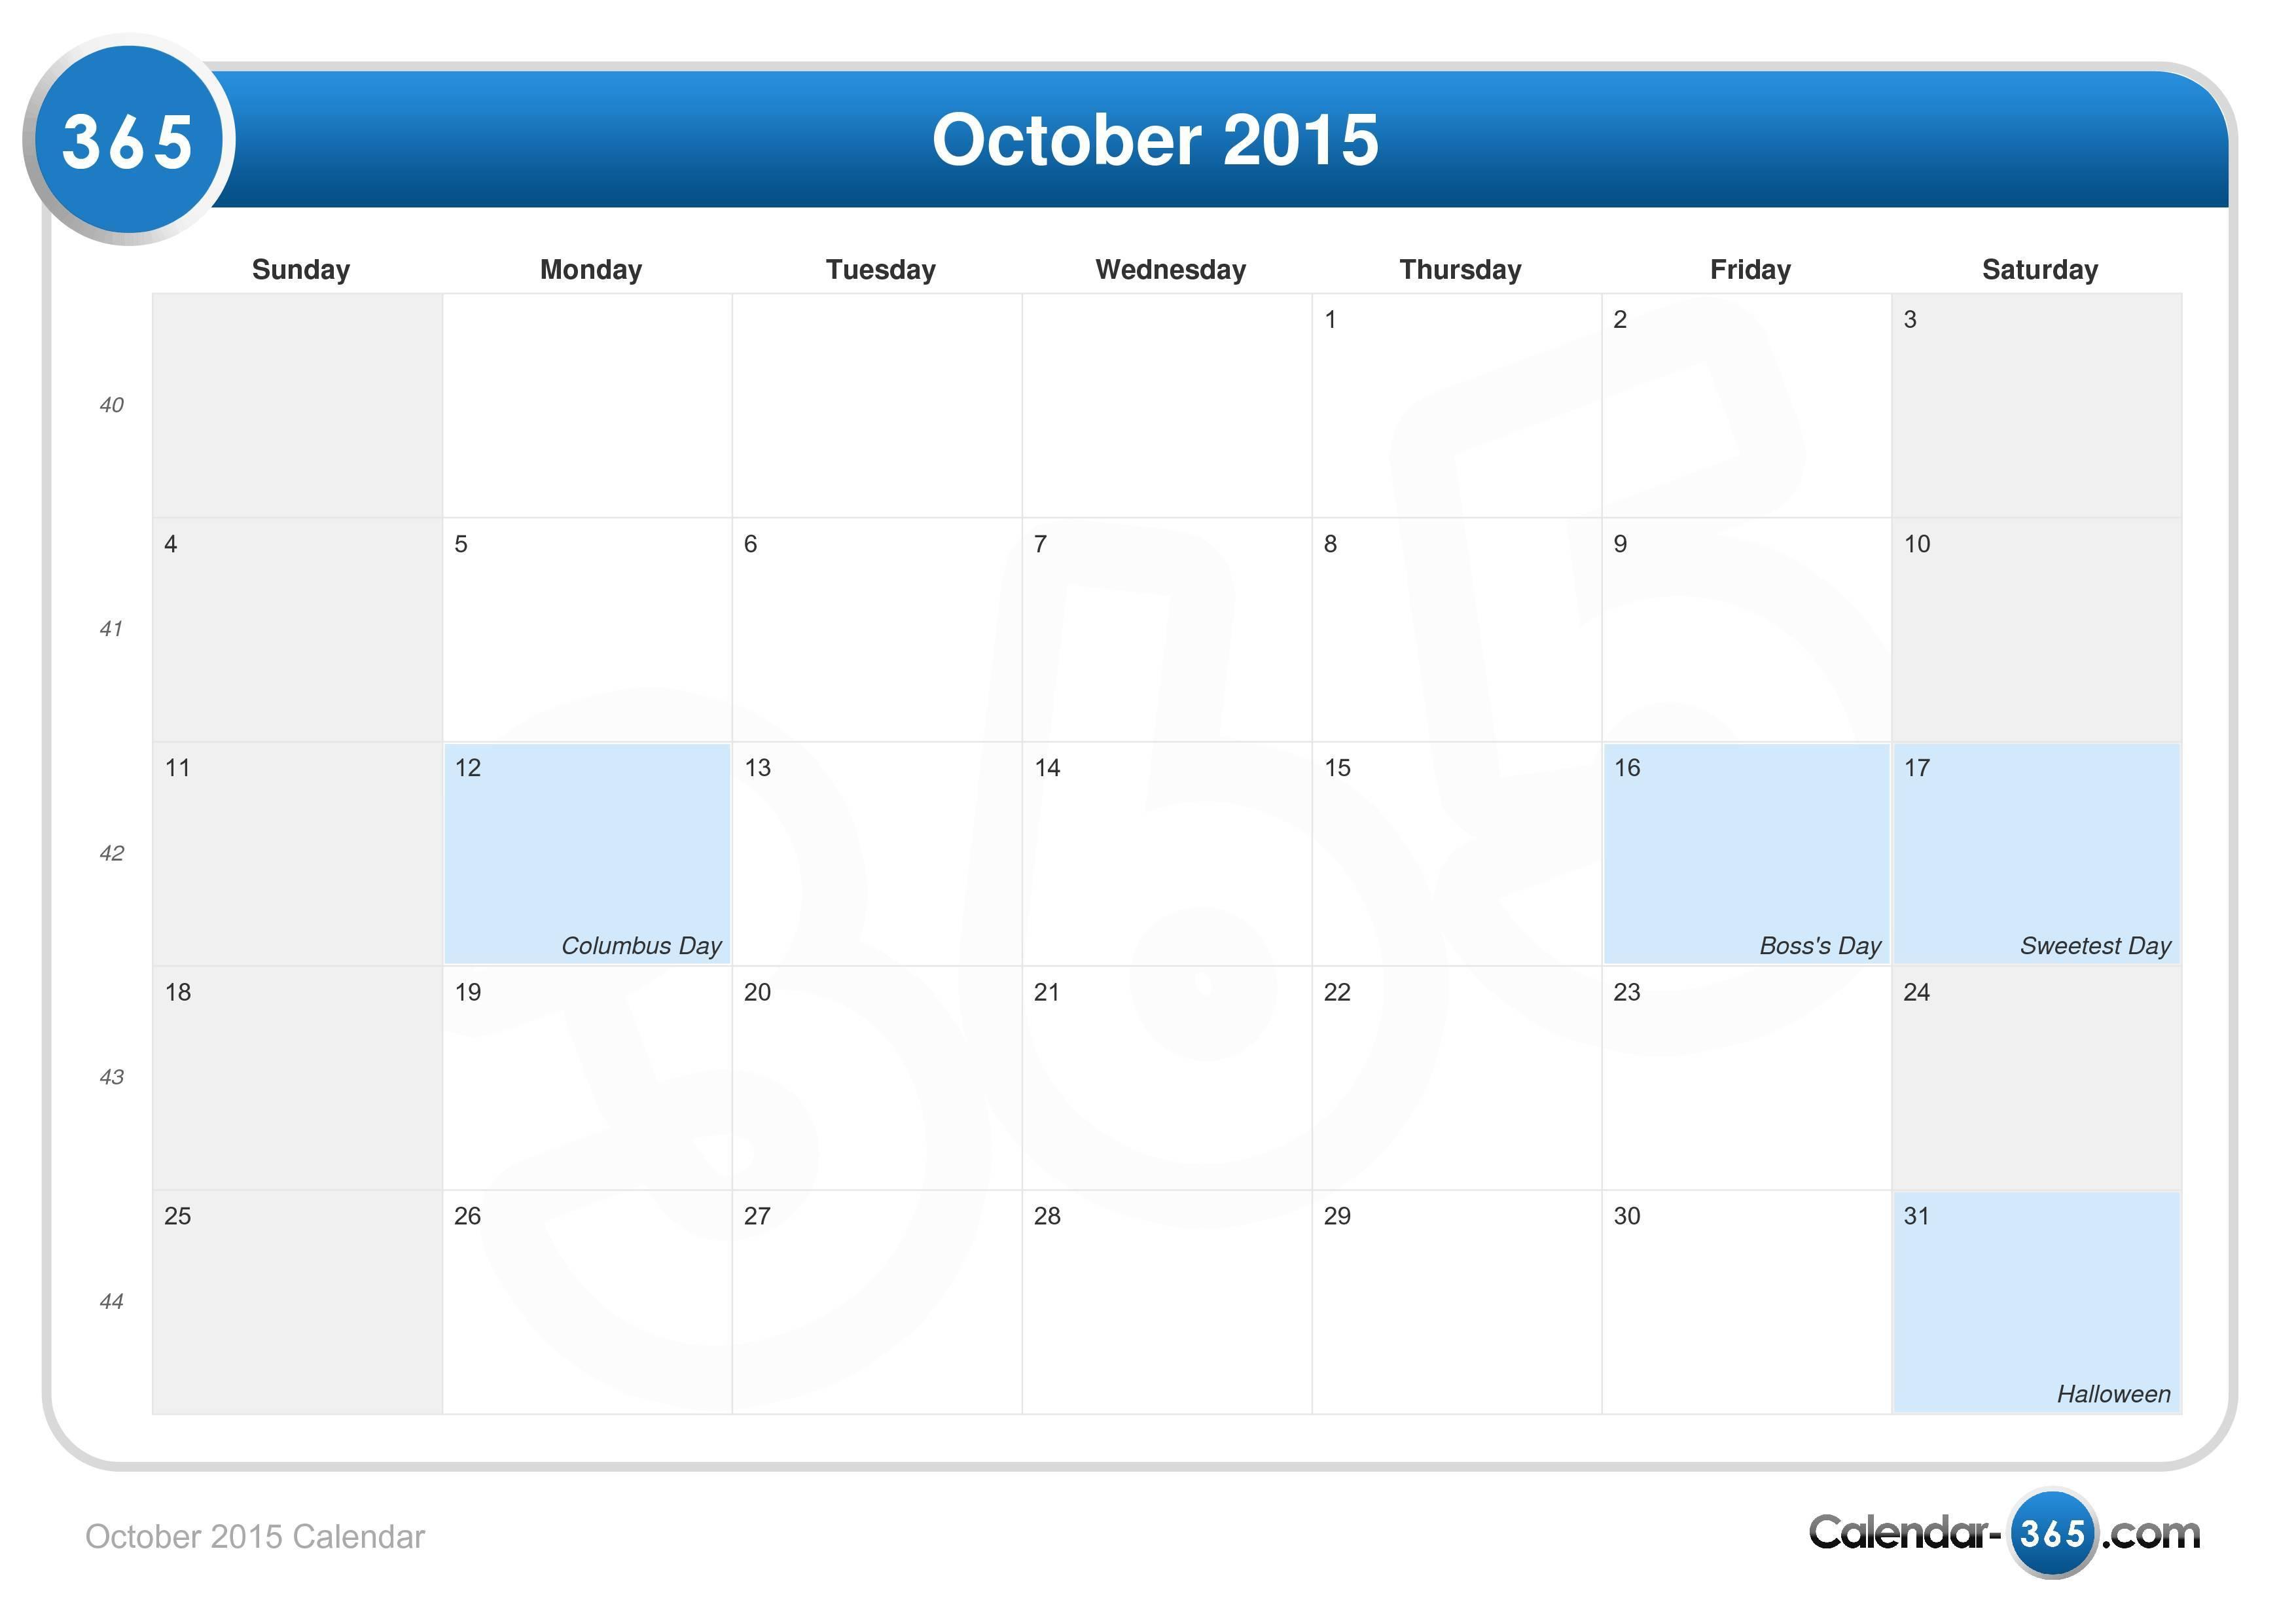 10.624 October 2015 Calendar